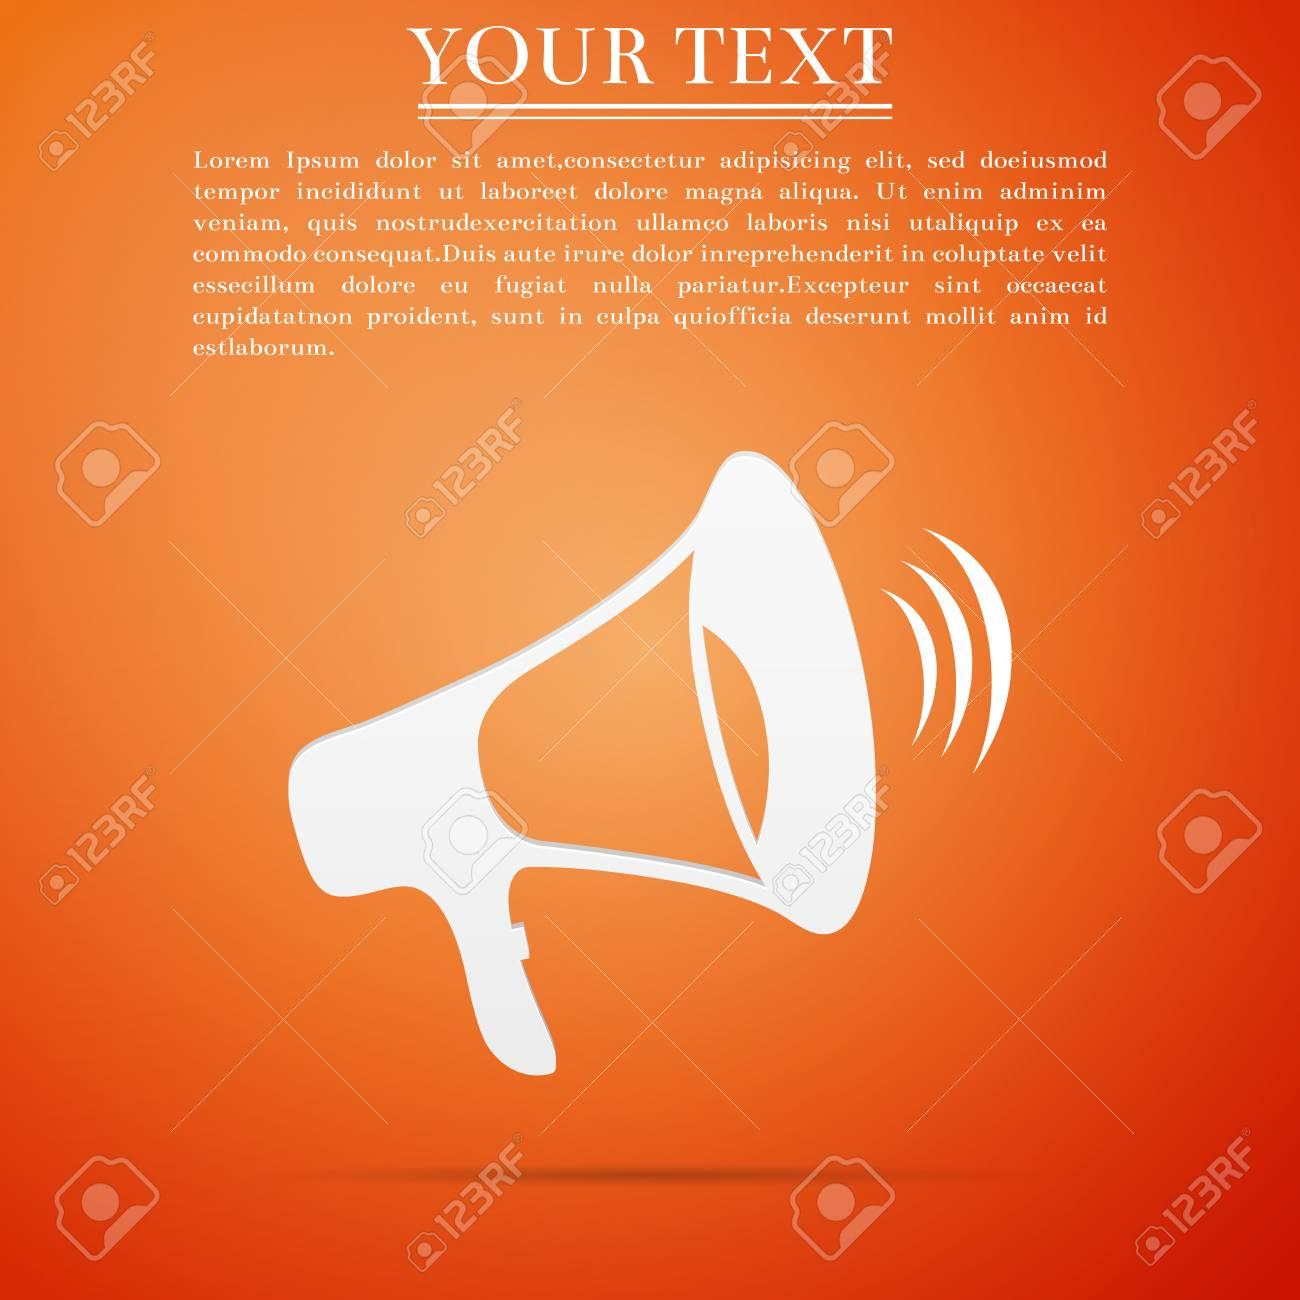 Megaphone icon isolated on orange background flat design vector megaphone icon isolated on orange background flat design vector illustration stock vector 88619503 publicscrutiny Gallery